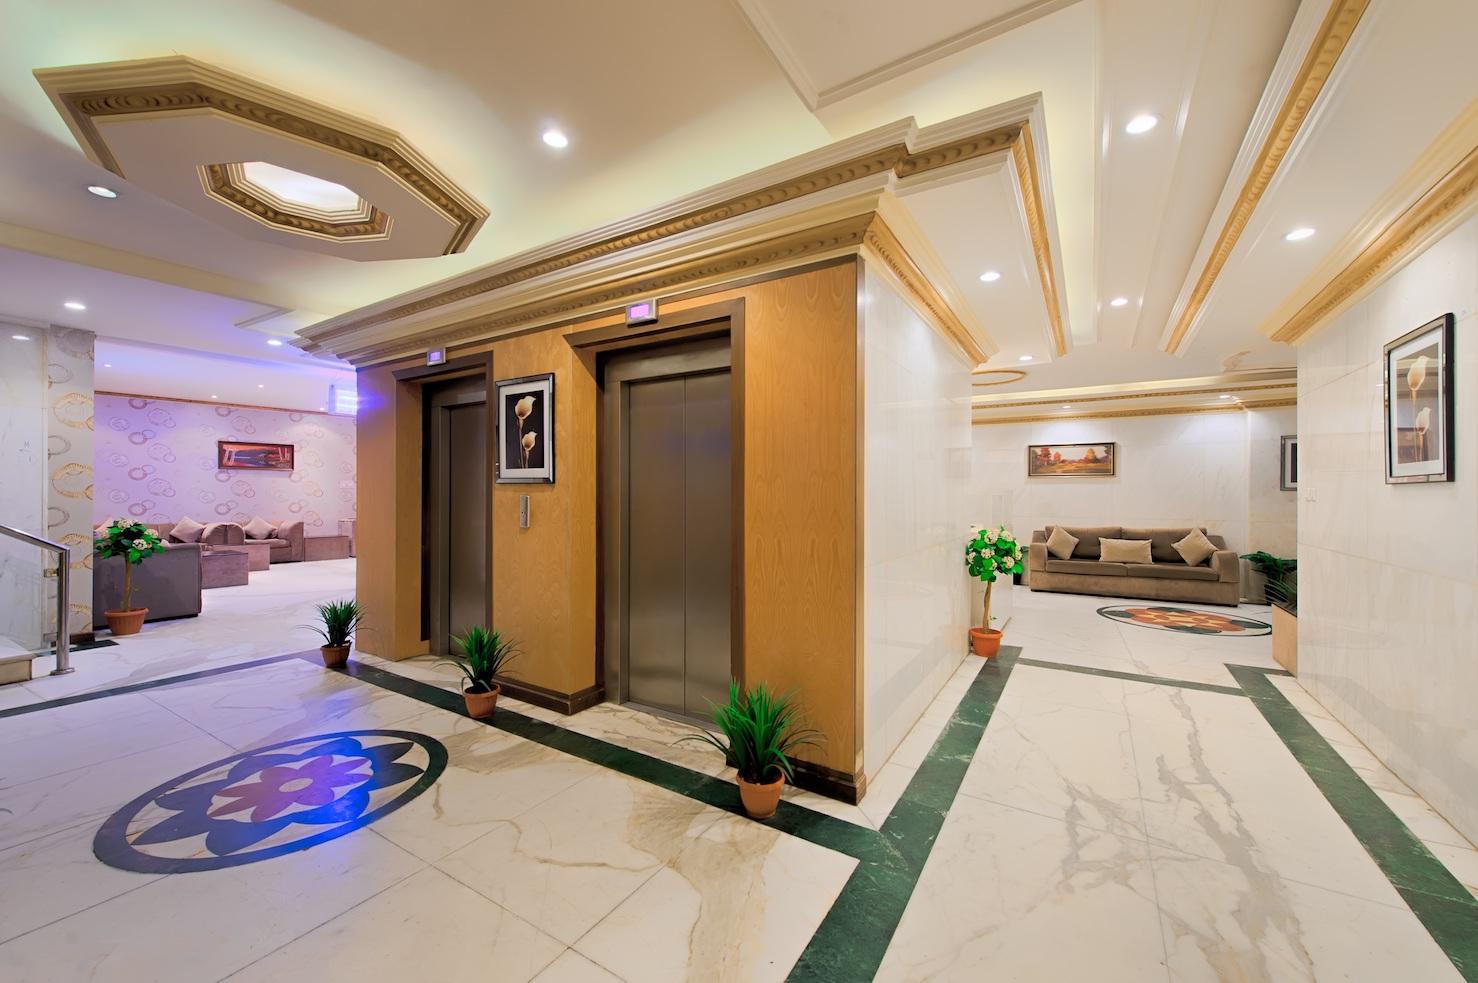 property-image_df53fe422f466664.jpg